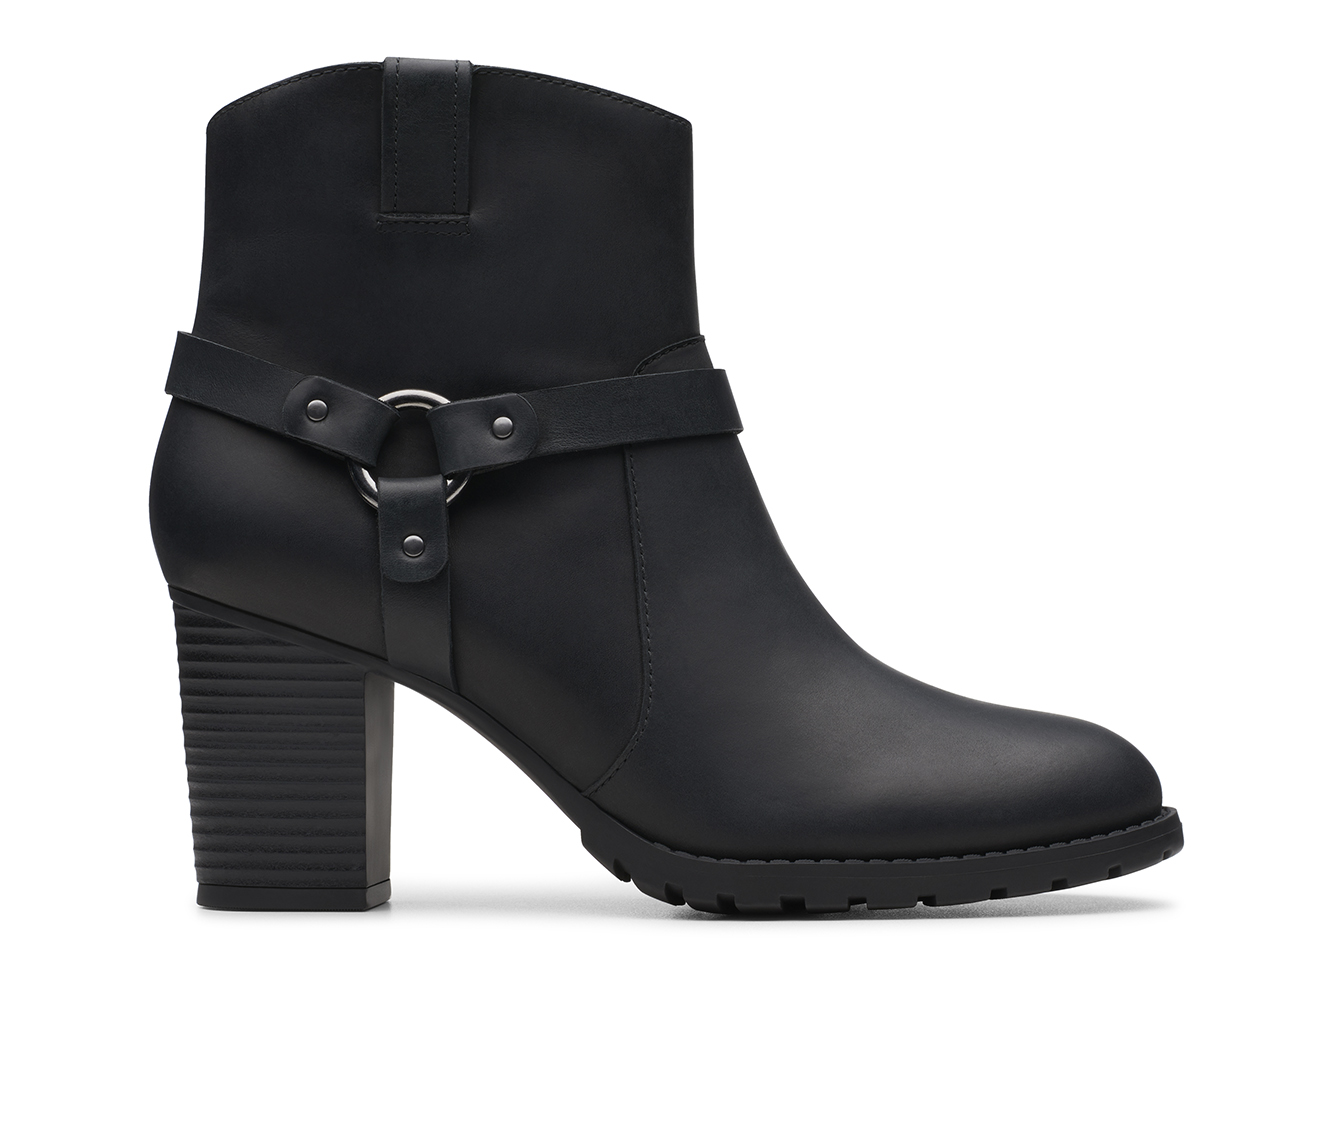 Clarks Verona Rock Women's Boots (Black - Leather)